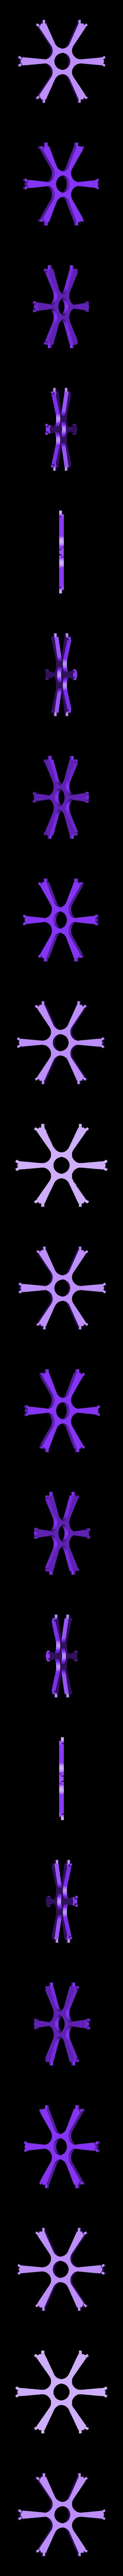 Center.stl Download free STL file Dolce Gusto Capsule Holder • 3D printer object, MVSValero